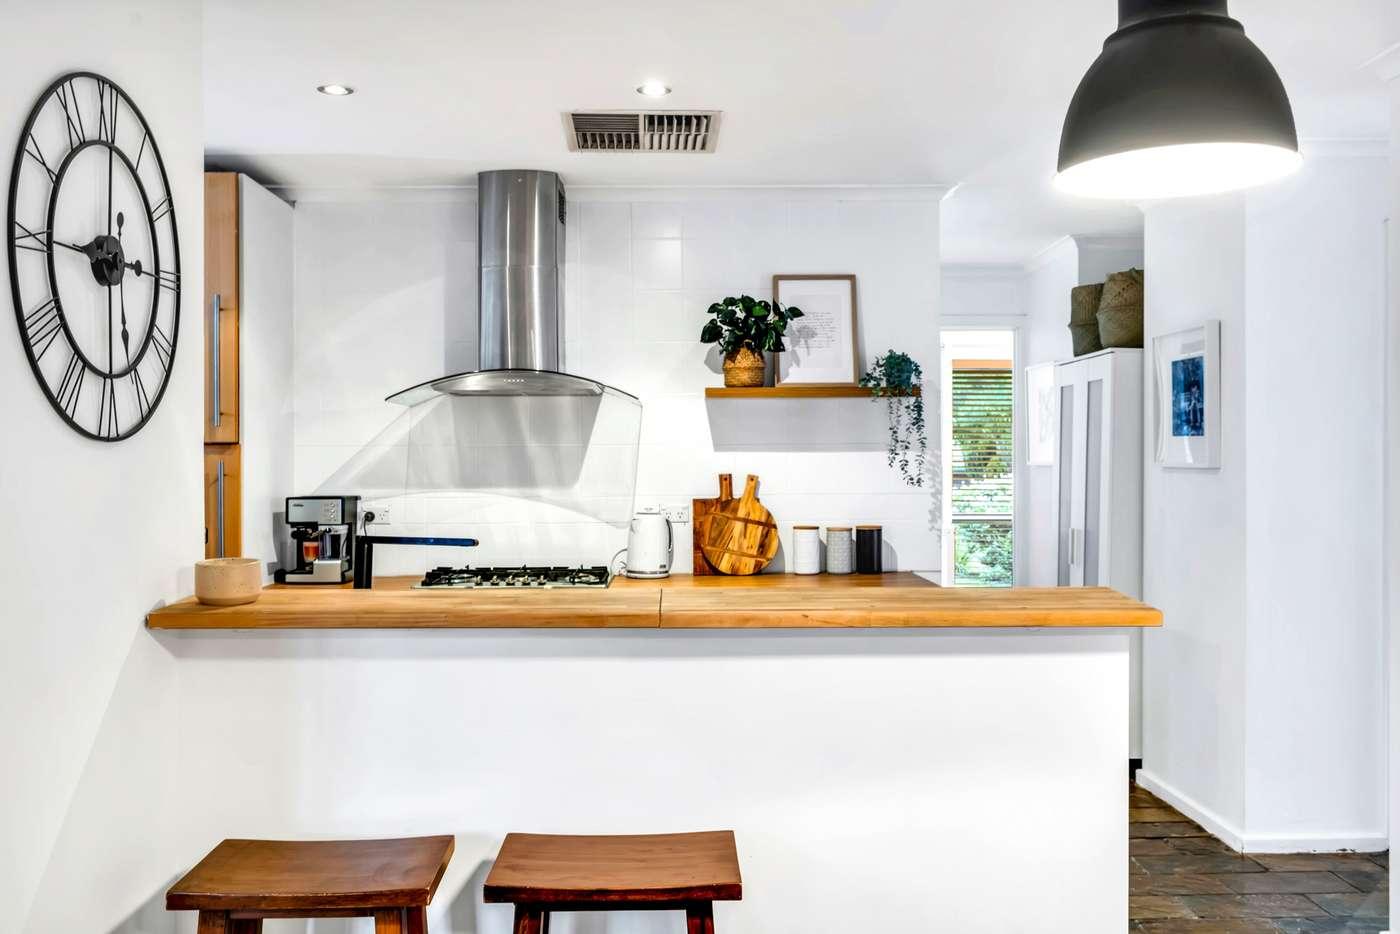 Main view of Homely house listing, 26 Kooyonga Way, Morphett Vale SA 5162